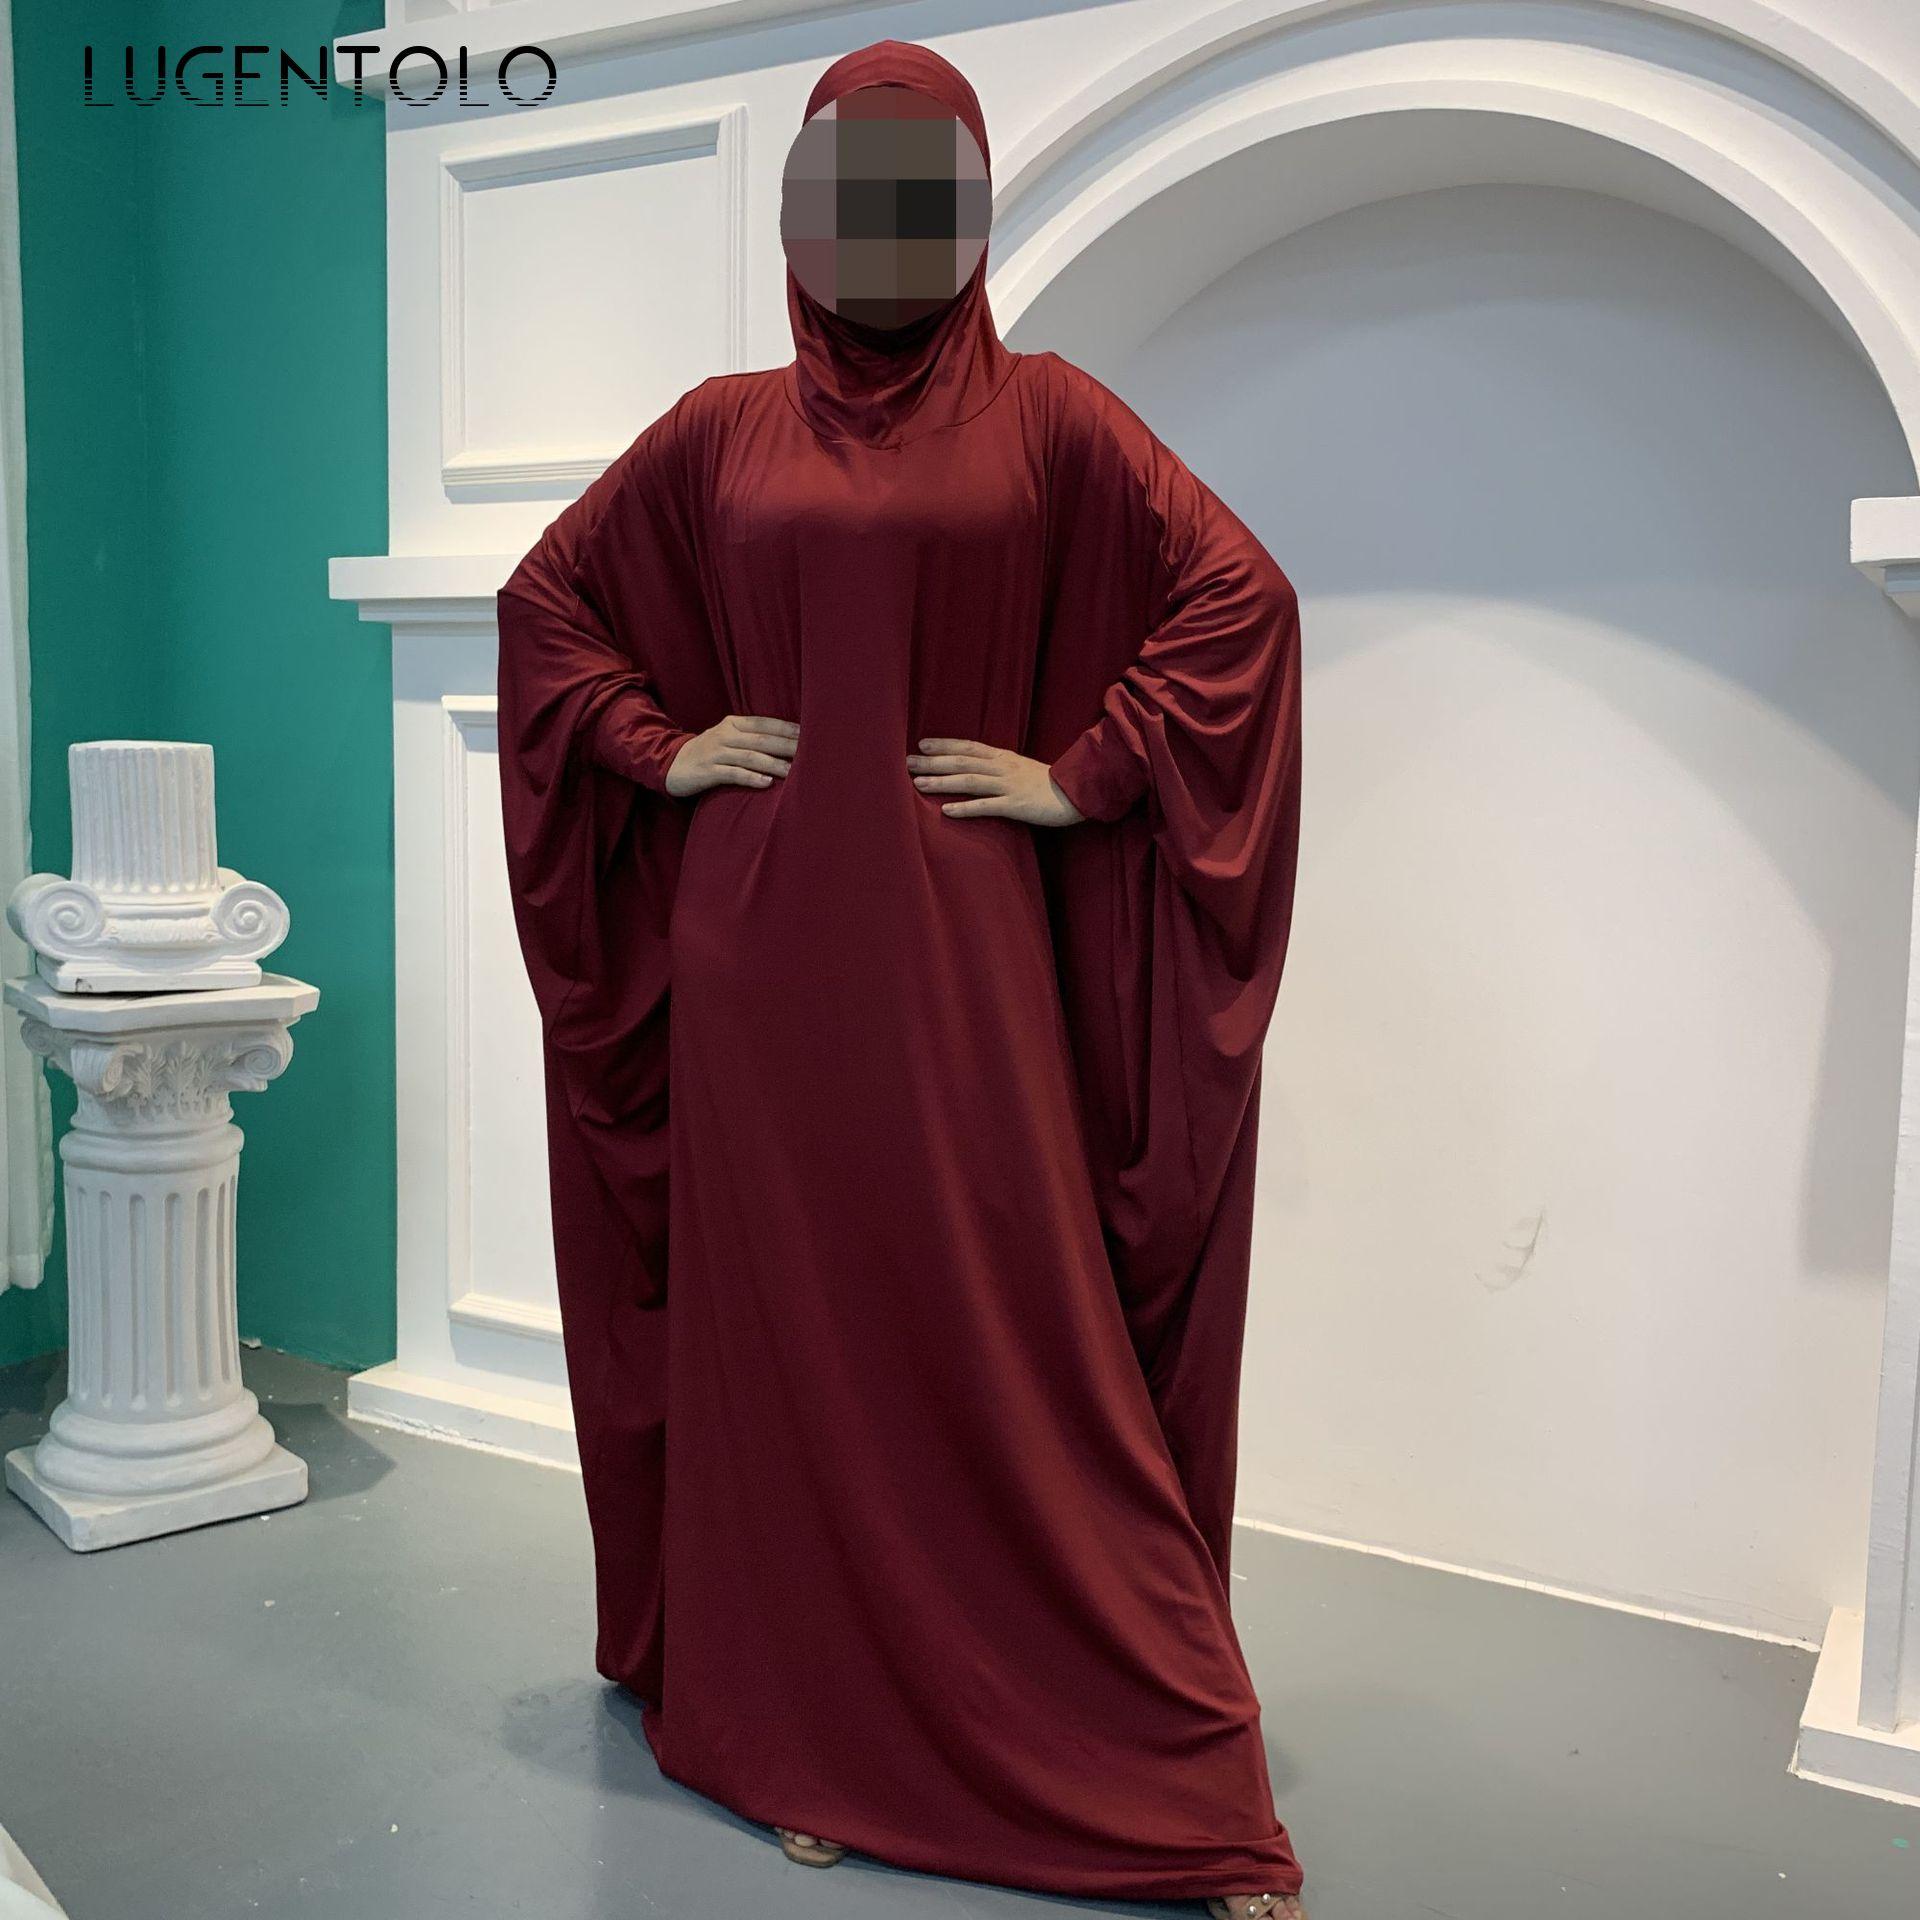 Lugentolo Elegant Women Loose Dress Hooded Fashion Muslim Long Bat Sleeve Solid Plus Size Dress Abaya Lady Simple Dresses